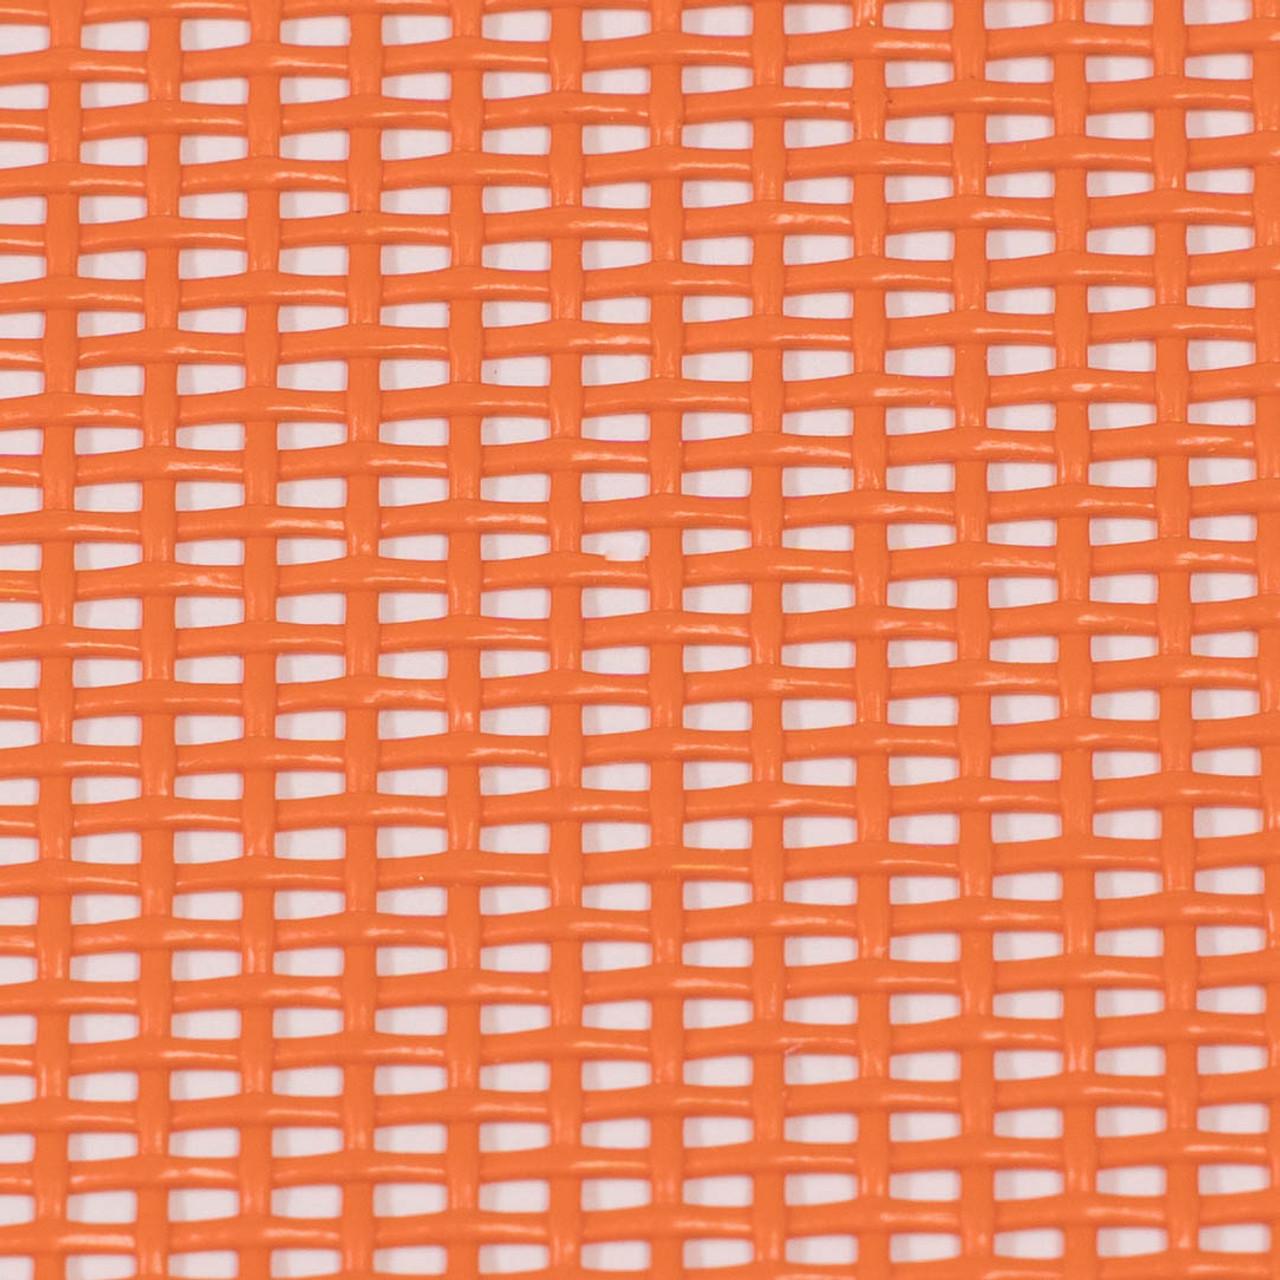 Orange Pet Screen Cut Pieces